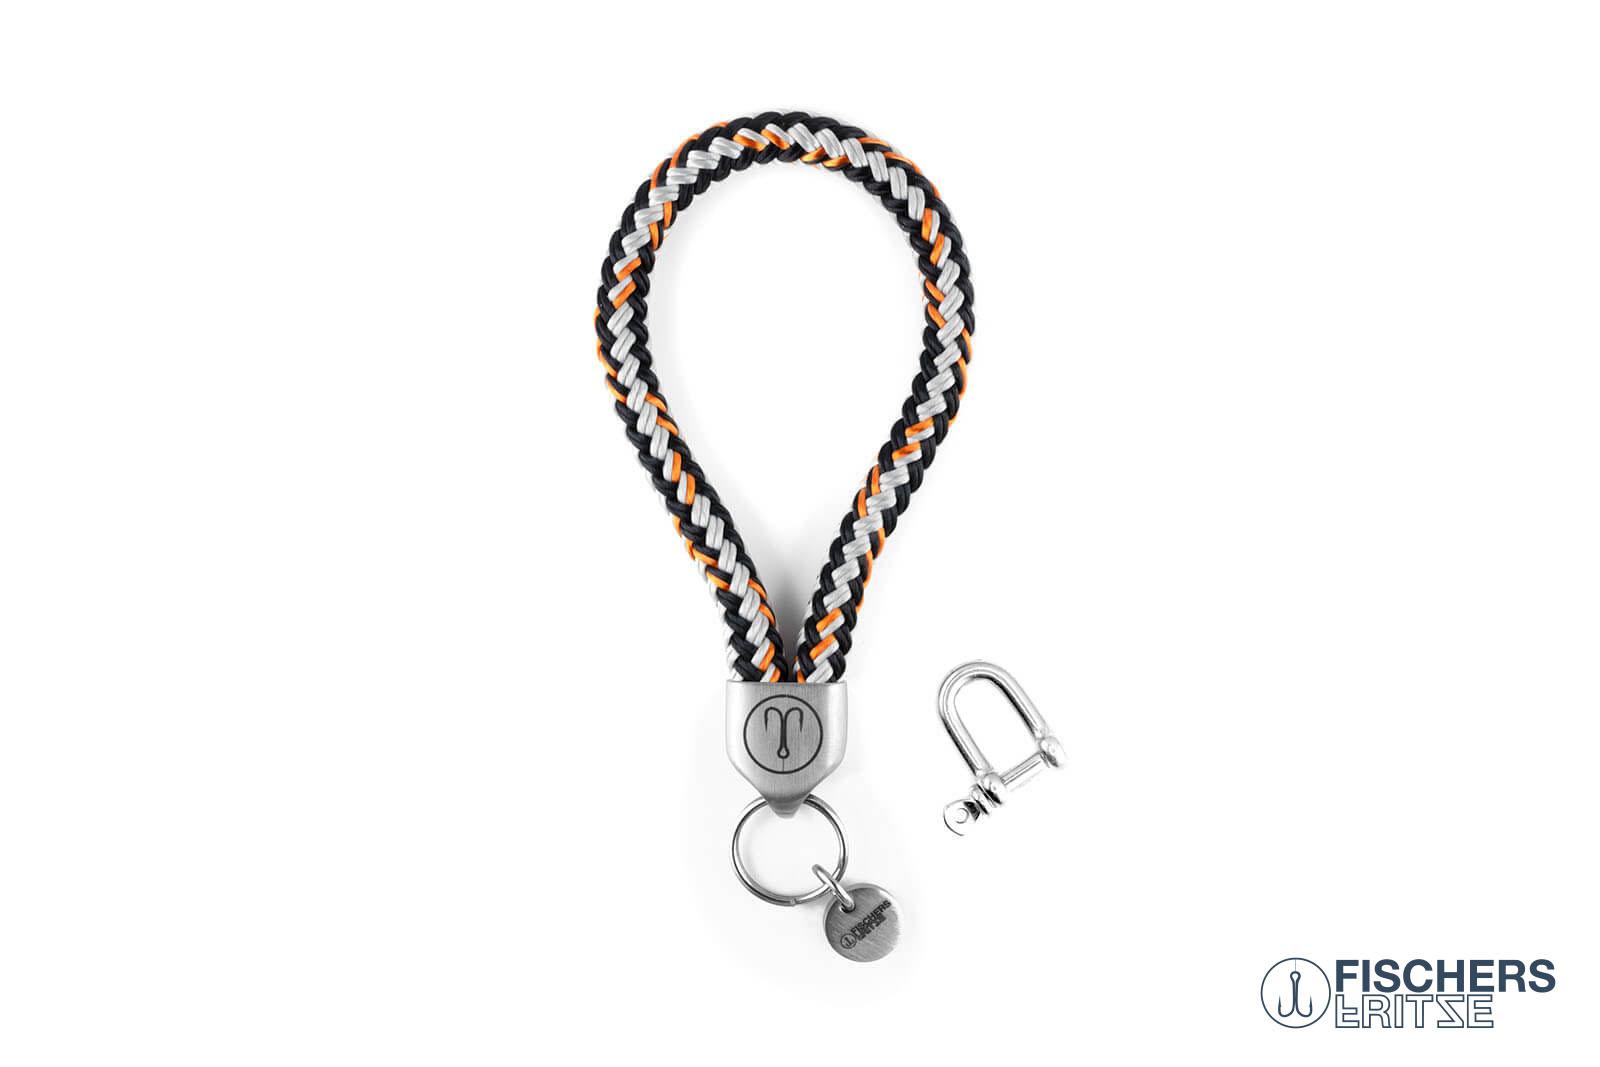 armband-fischers-fritze-dickerhering-edition-2-segeltau-schaekel